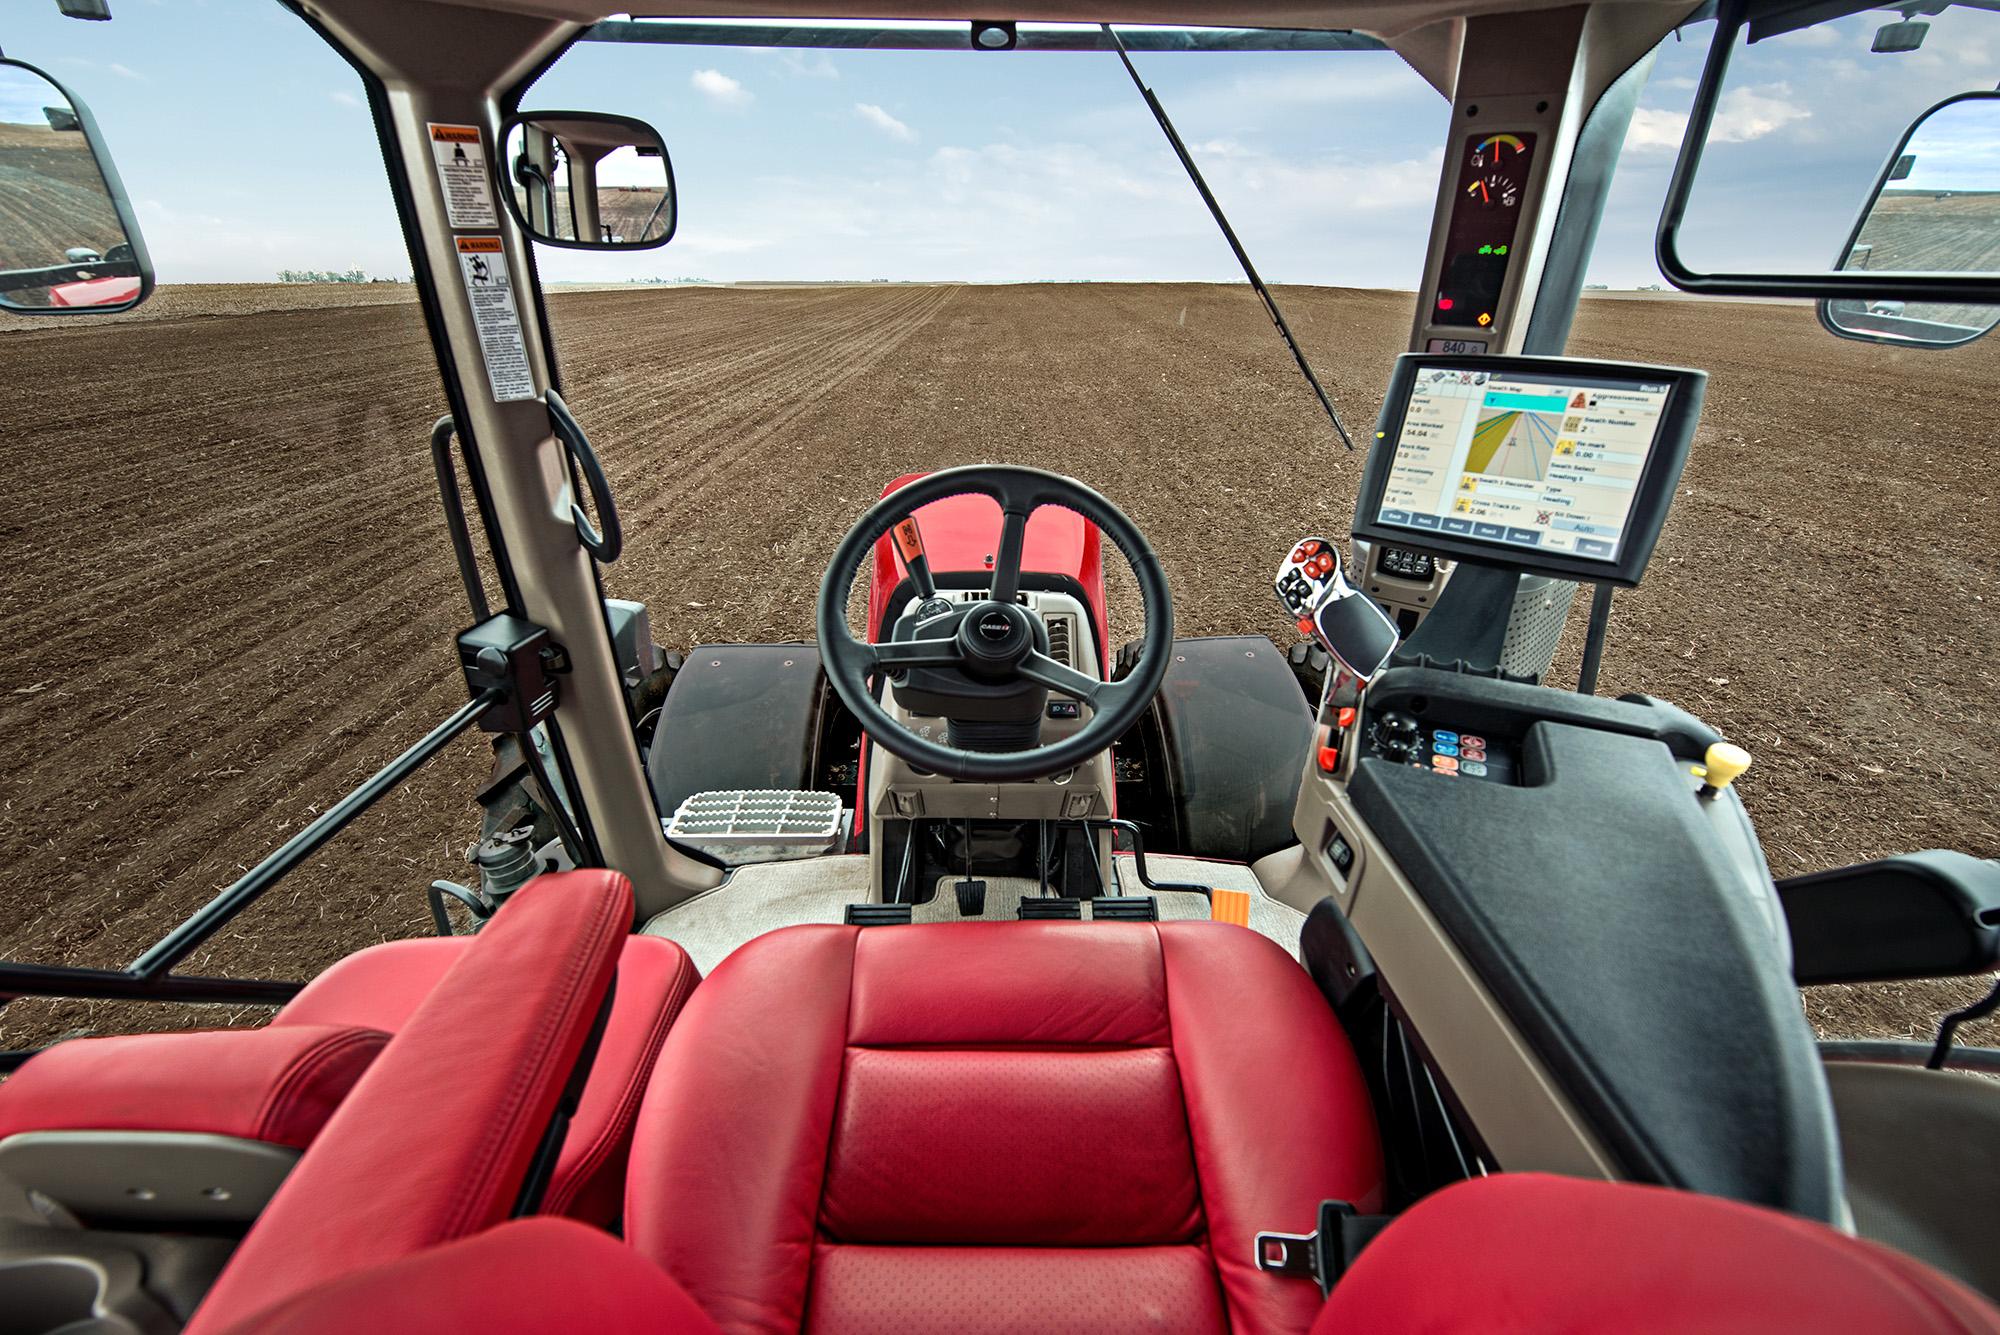 Case Ih Mx 270 Wiring Diagrams Online Box Diagram Magnum Series Rowtrac Scraper Tractors For Row Crop Farming Tractor